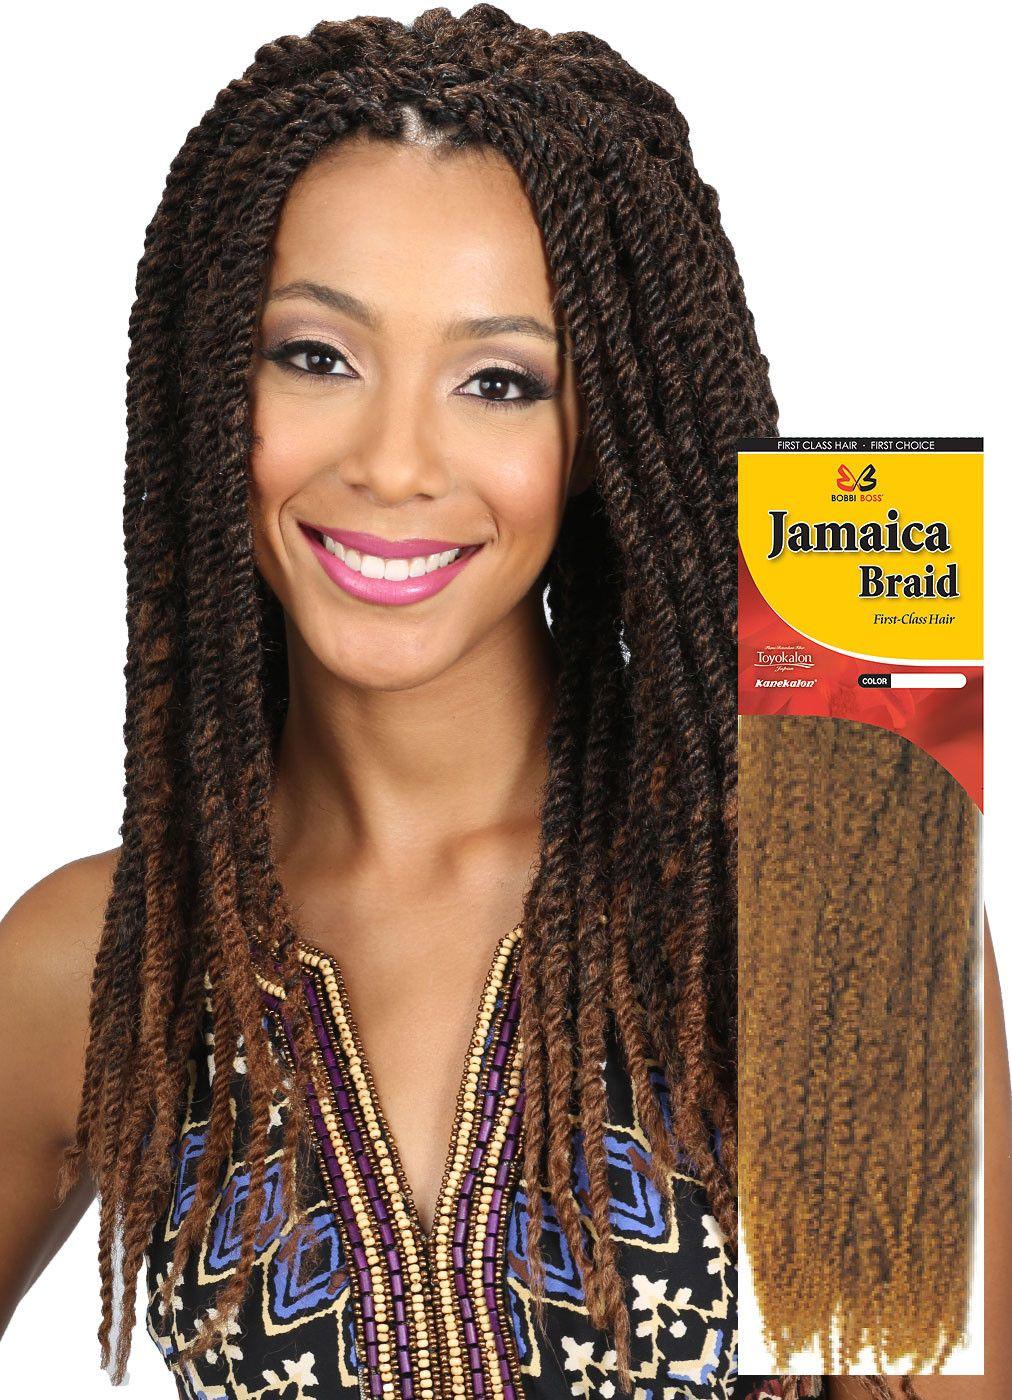 Bobbi Boss Jamaica (Marley) Braid App, Free and Marley